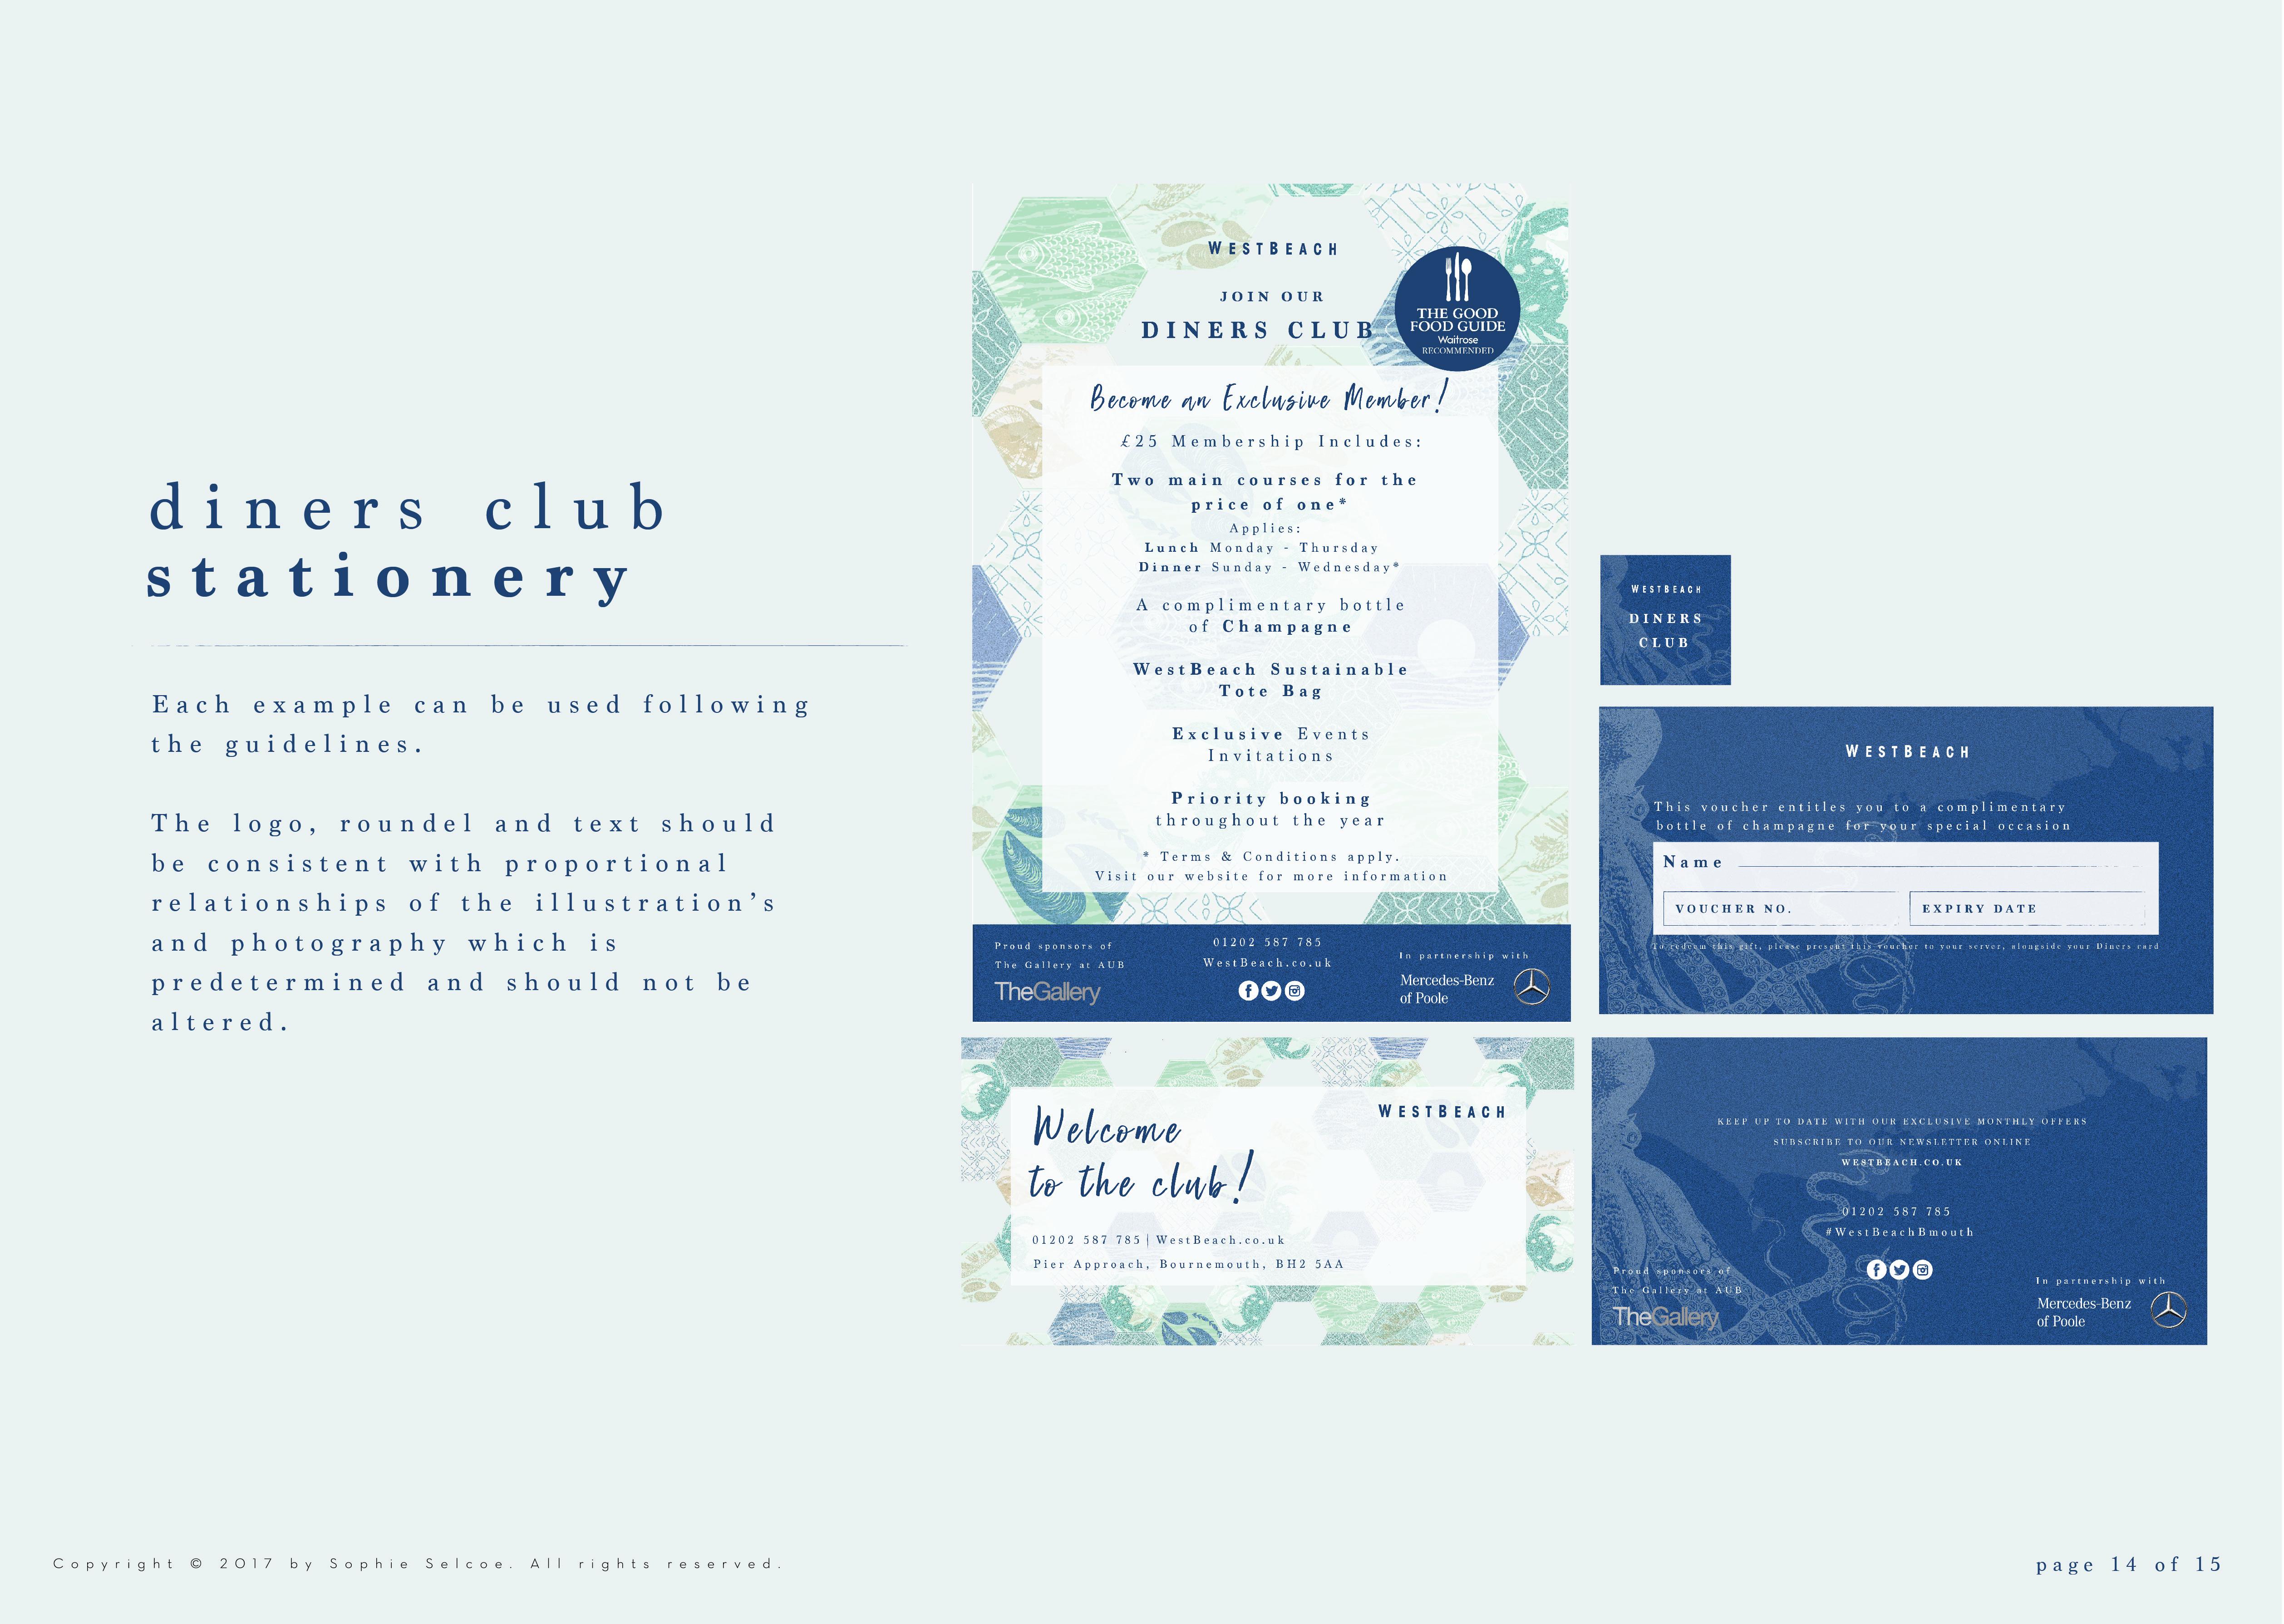 WestBeach Diners Club Stationery